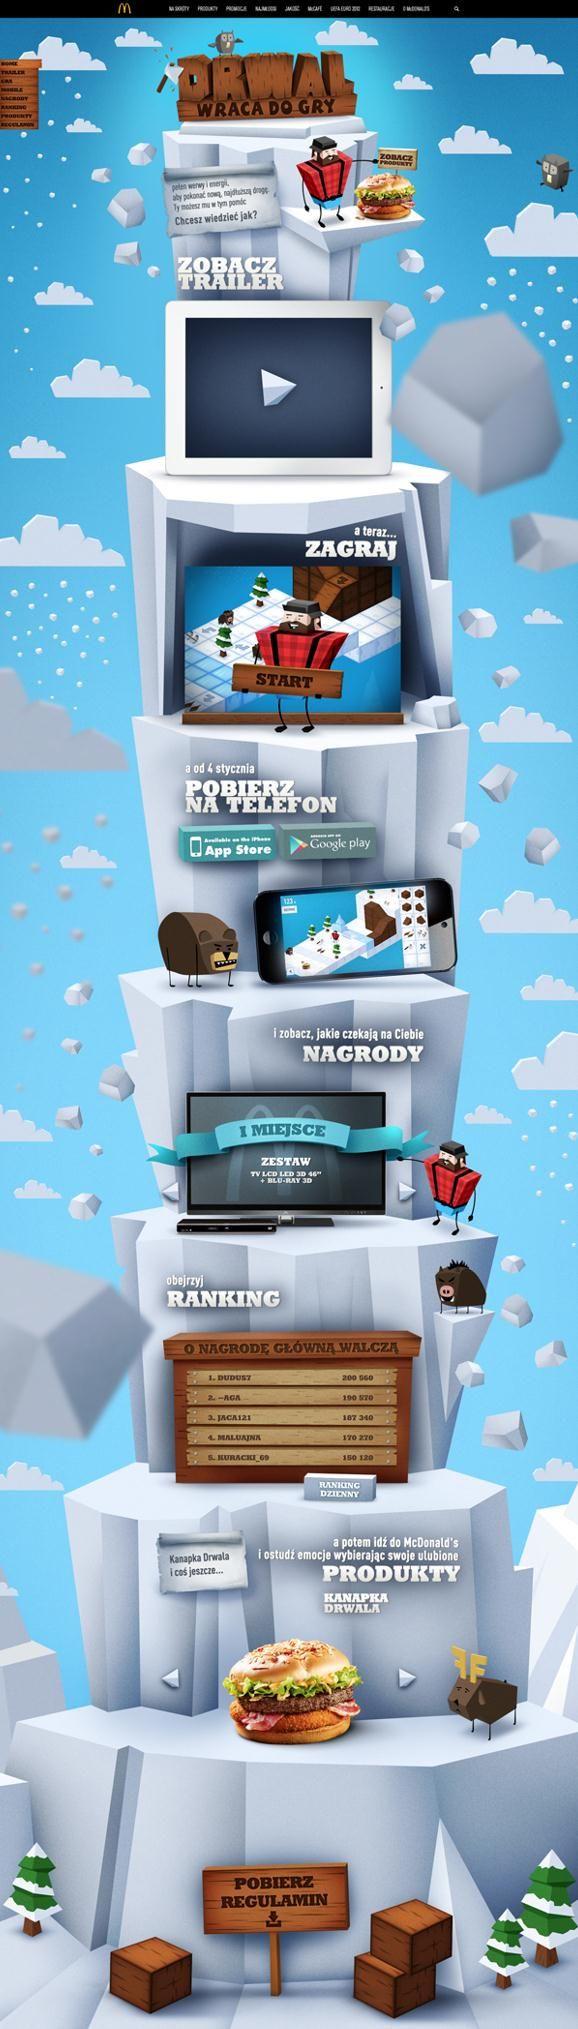 Unique Web Design, McDonald #WebDesign #Design (http://www.pinterest.com/aldenchong/)